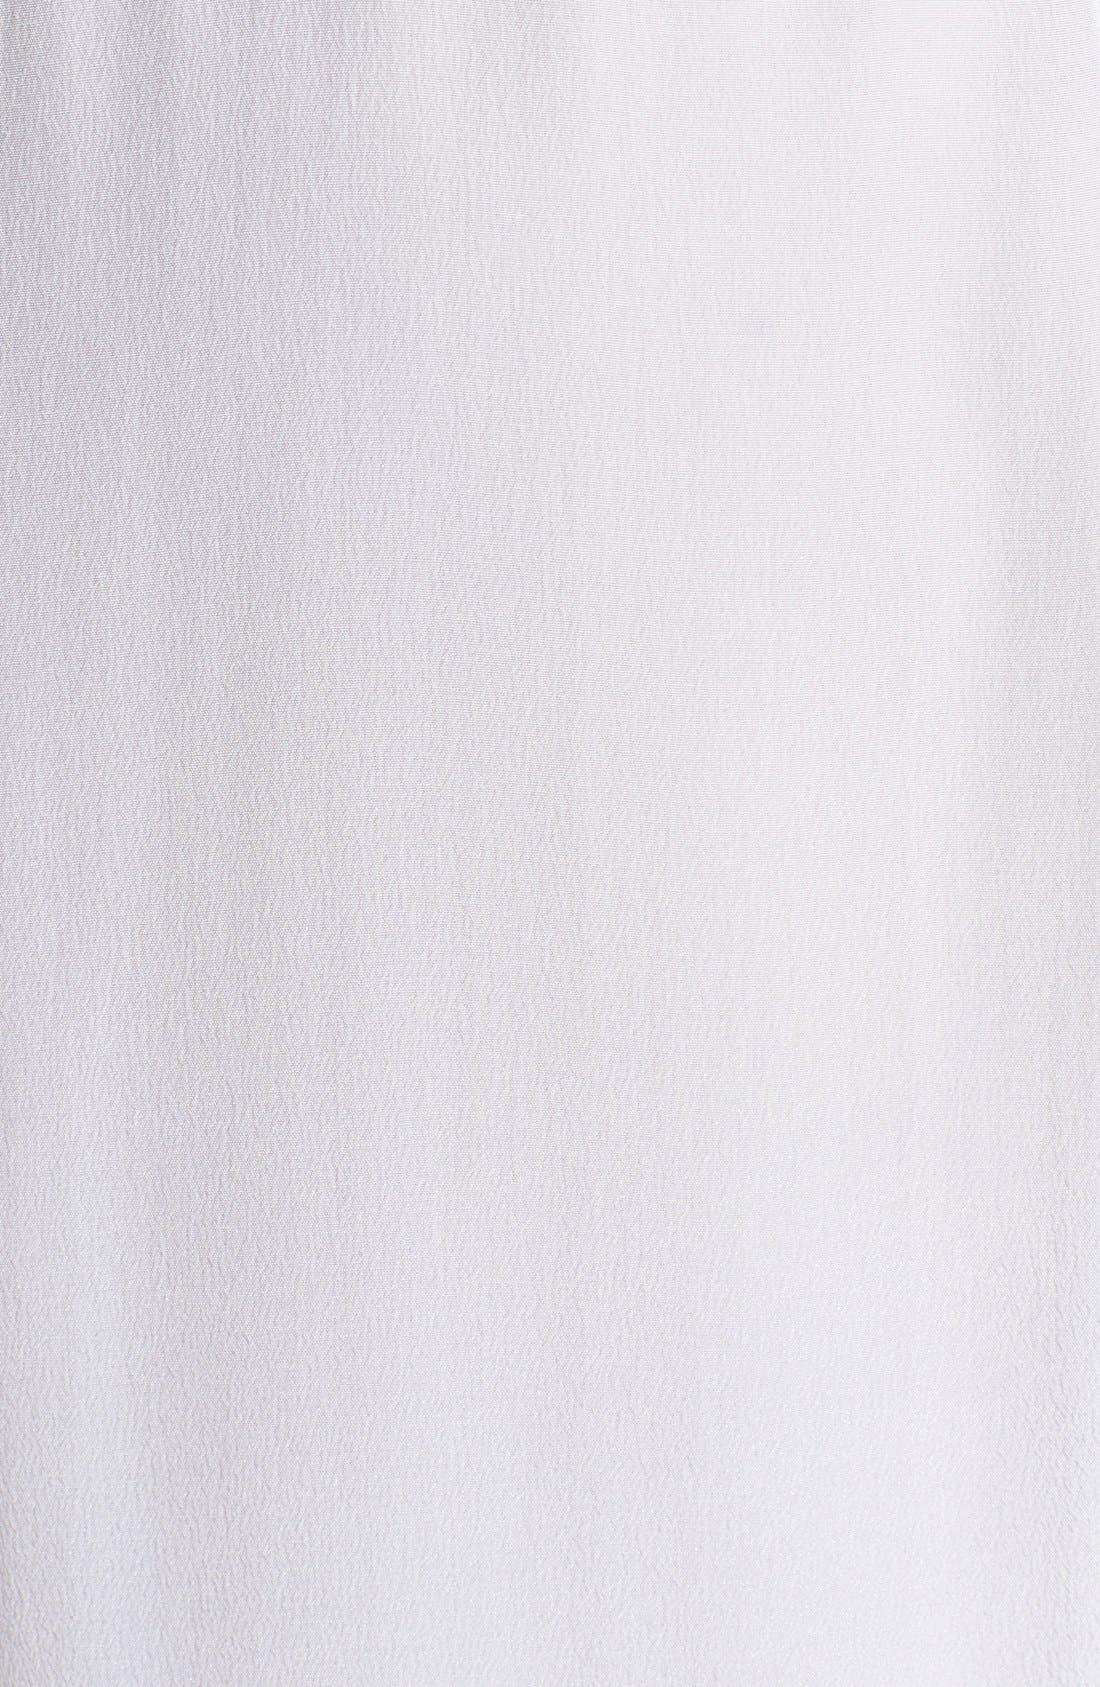 EQUIPMENT,                             'Keira' Silk Top,                             Alternate thumbnail 3, color,                             111